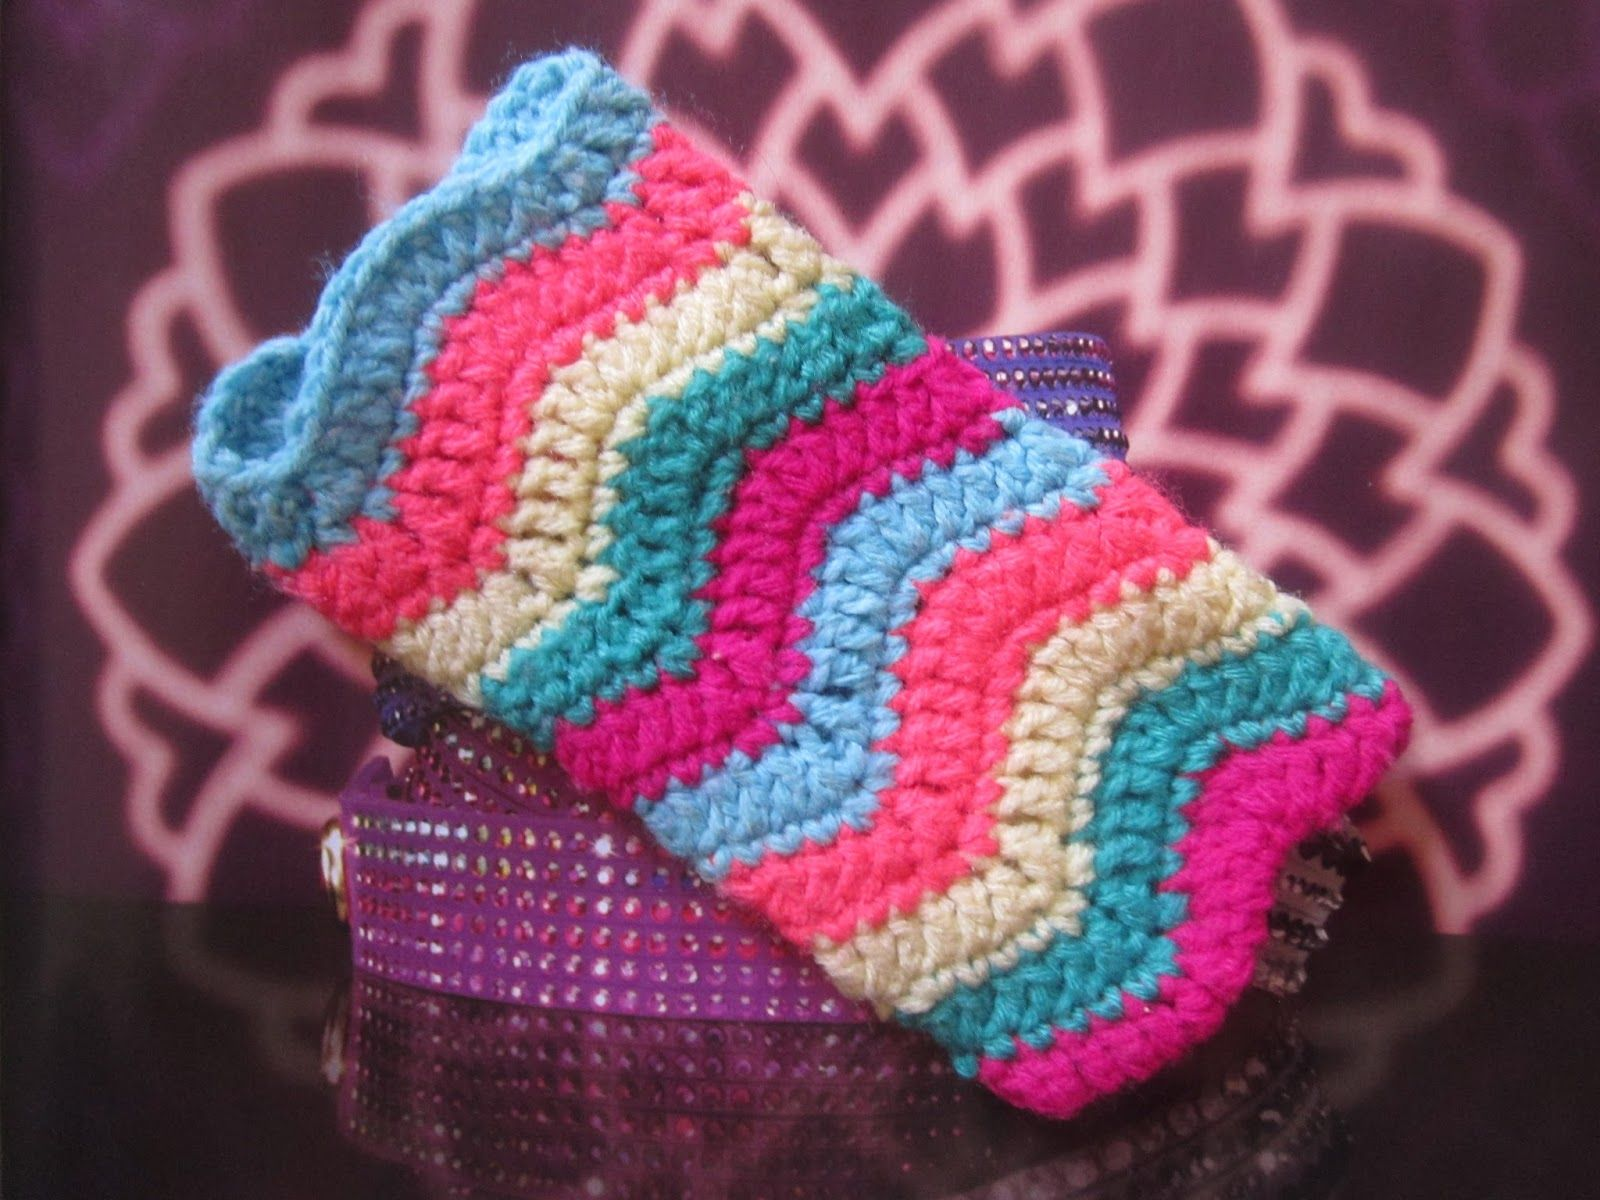 Crochet ripple stitch phone case! | my crafts | Pinterest